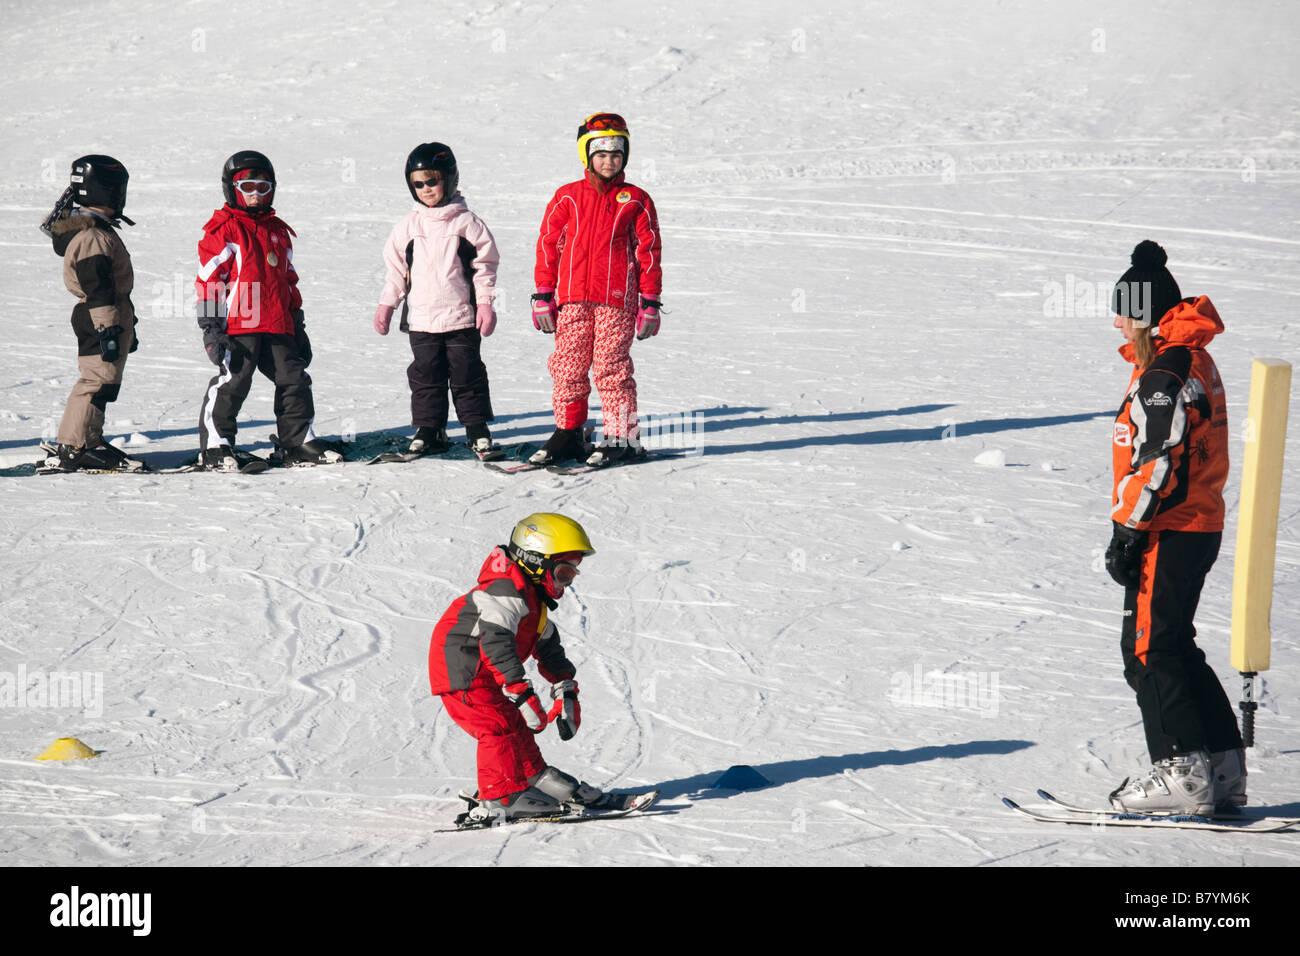 Rauris Austria Europe.  Children learning on ski school nursery slopes on winter snow - Stock Image